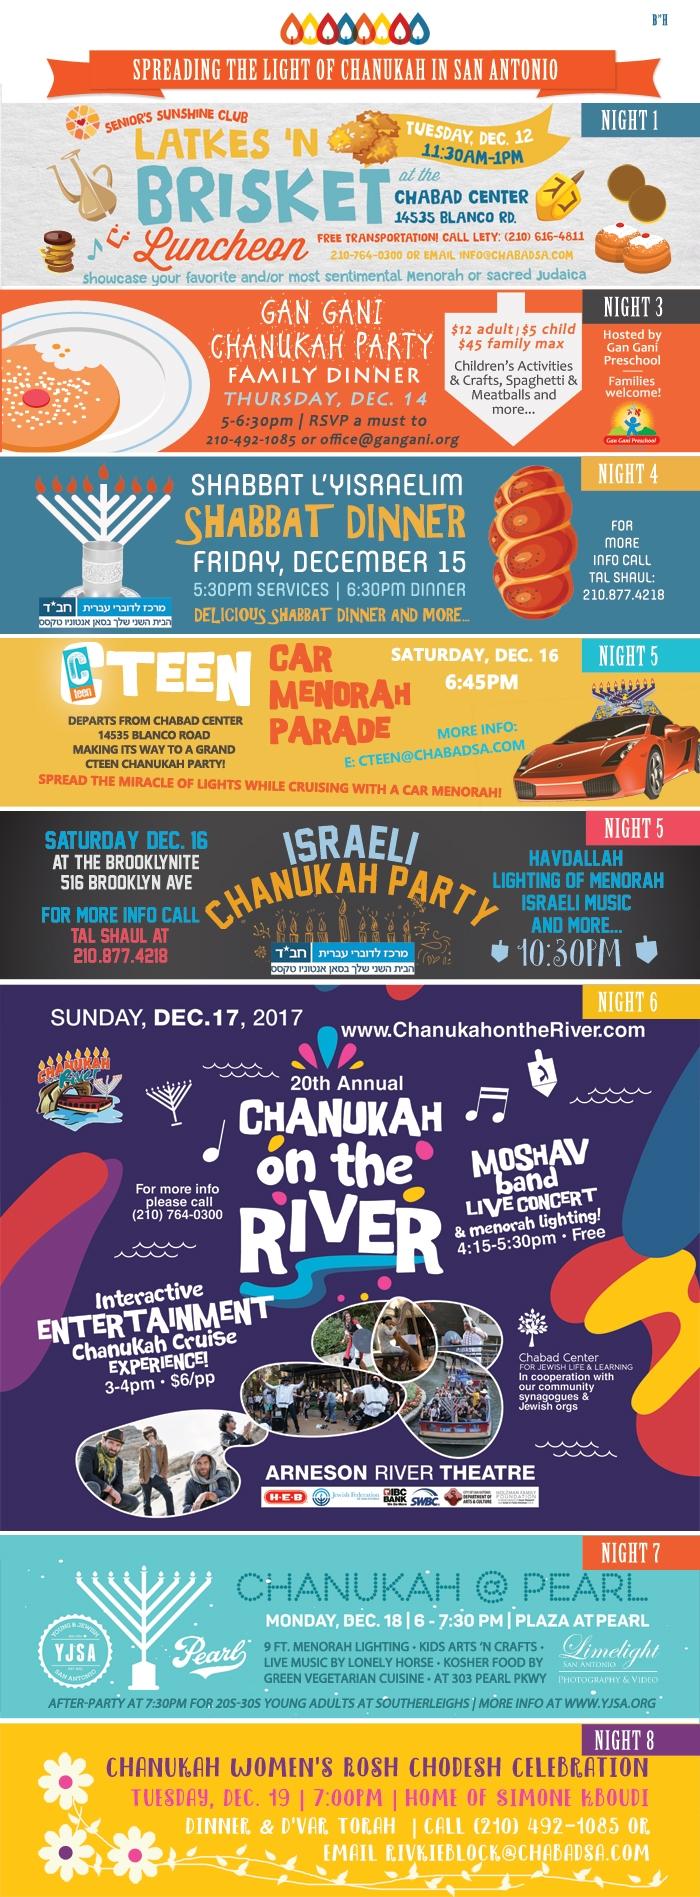 Chabad Chanukah Programs 2013.jpg